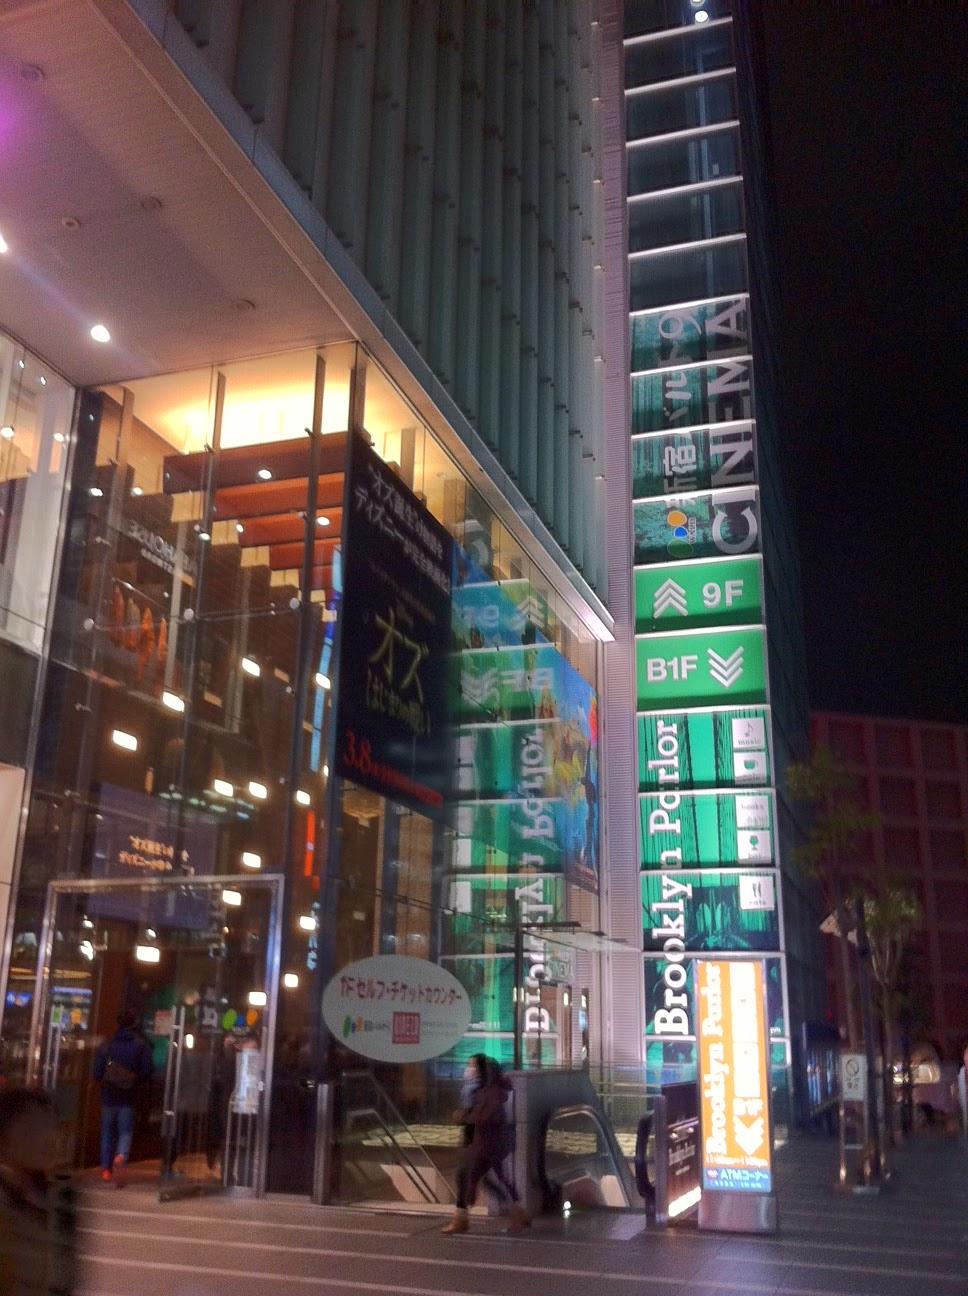 Brooklyn Parlor, Shinjuku, Tokyo under Wald9 Cinema complex.